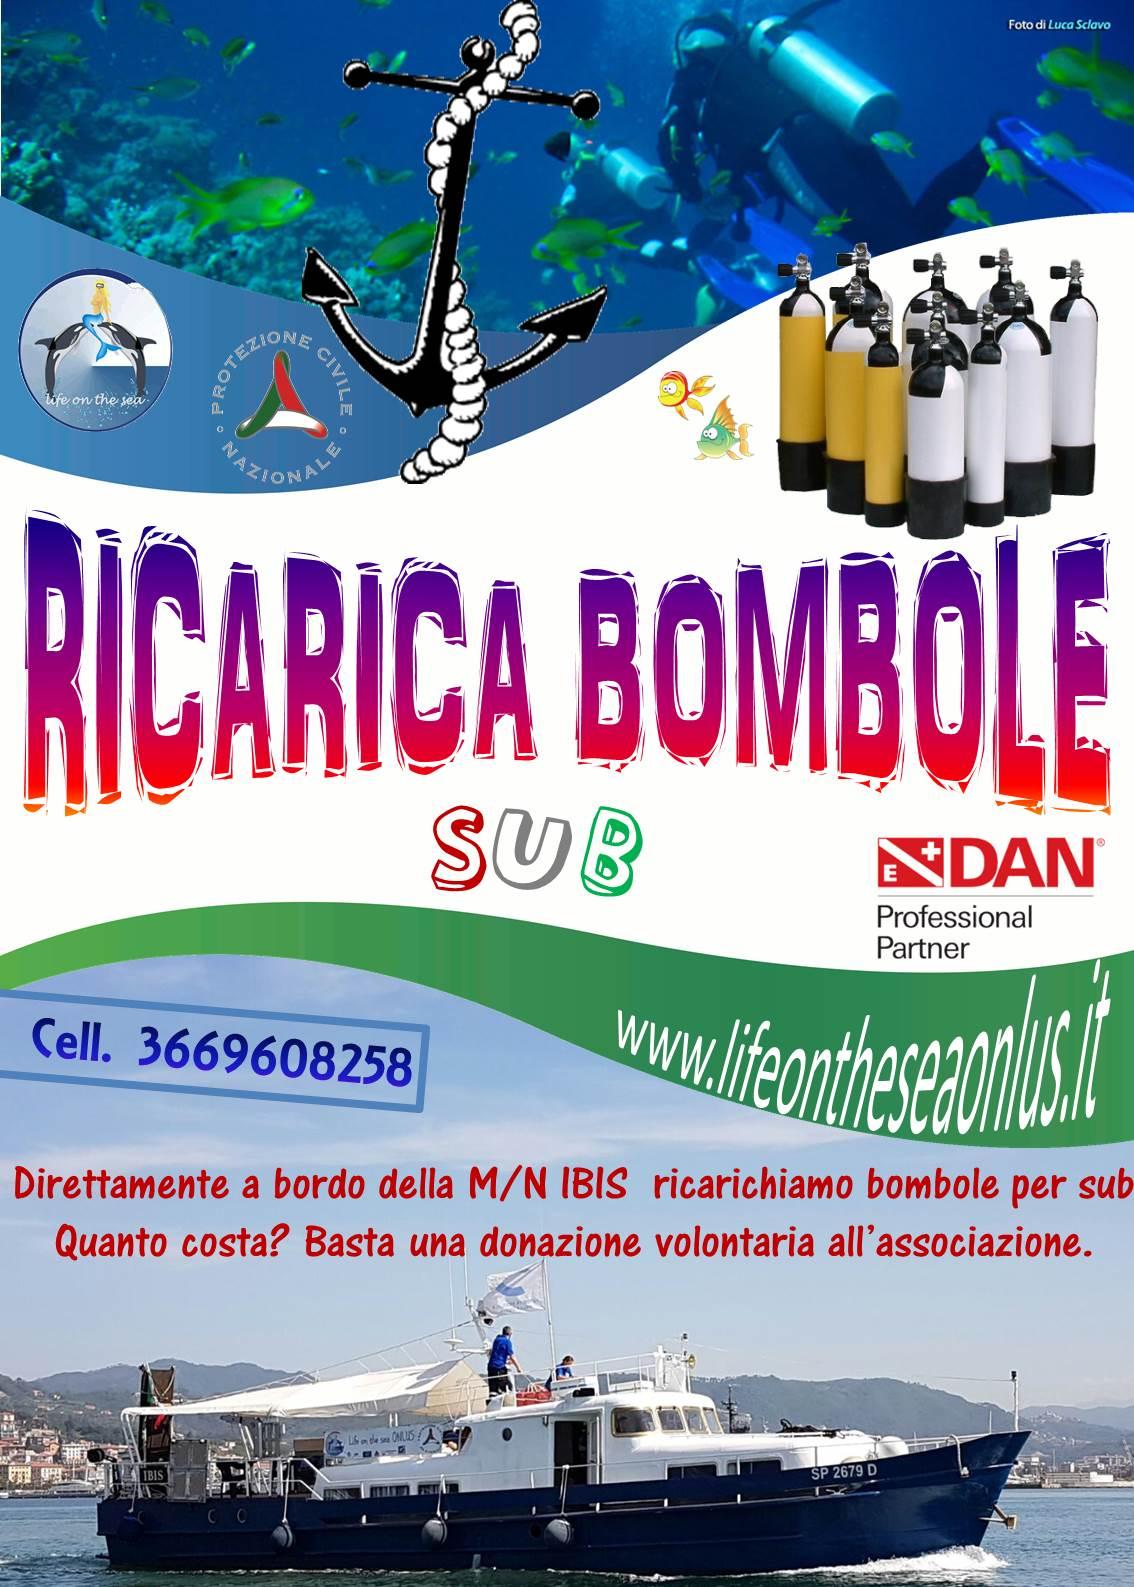 Ricarica bombole SUB